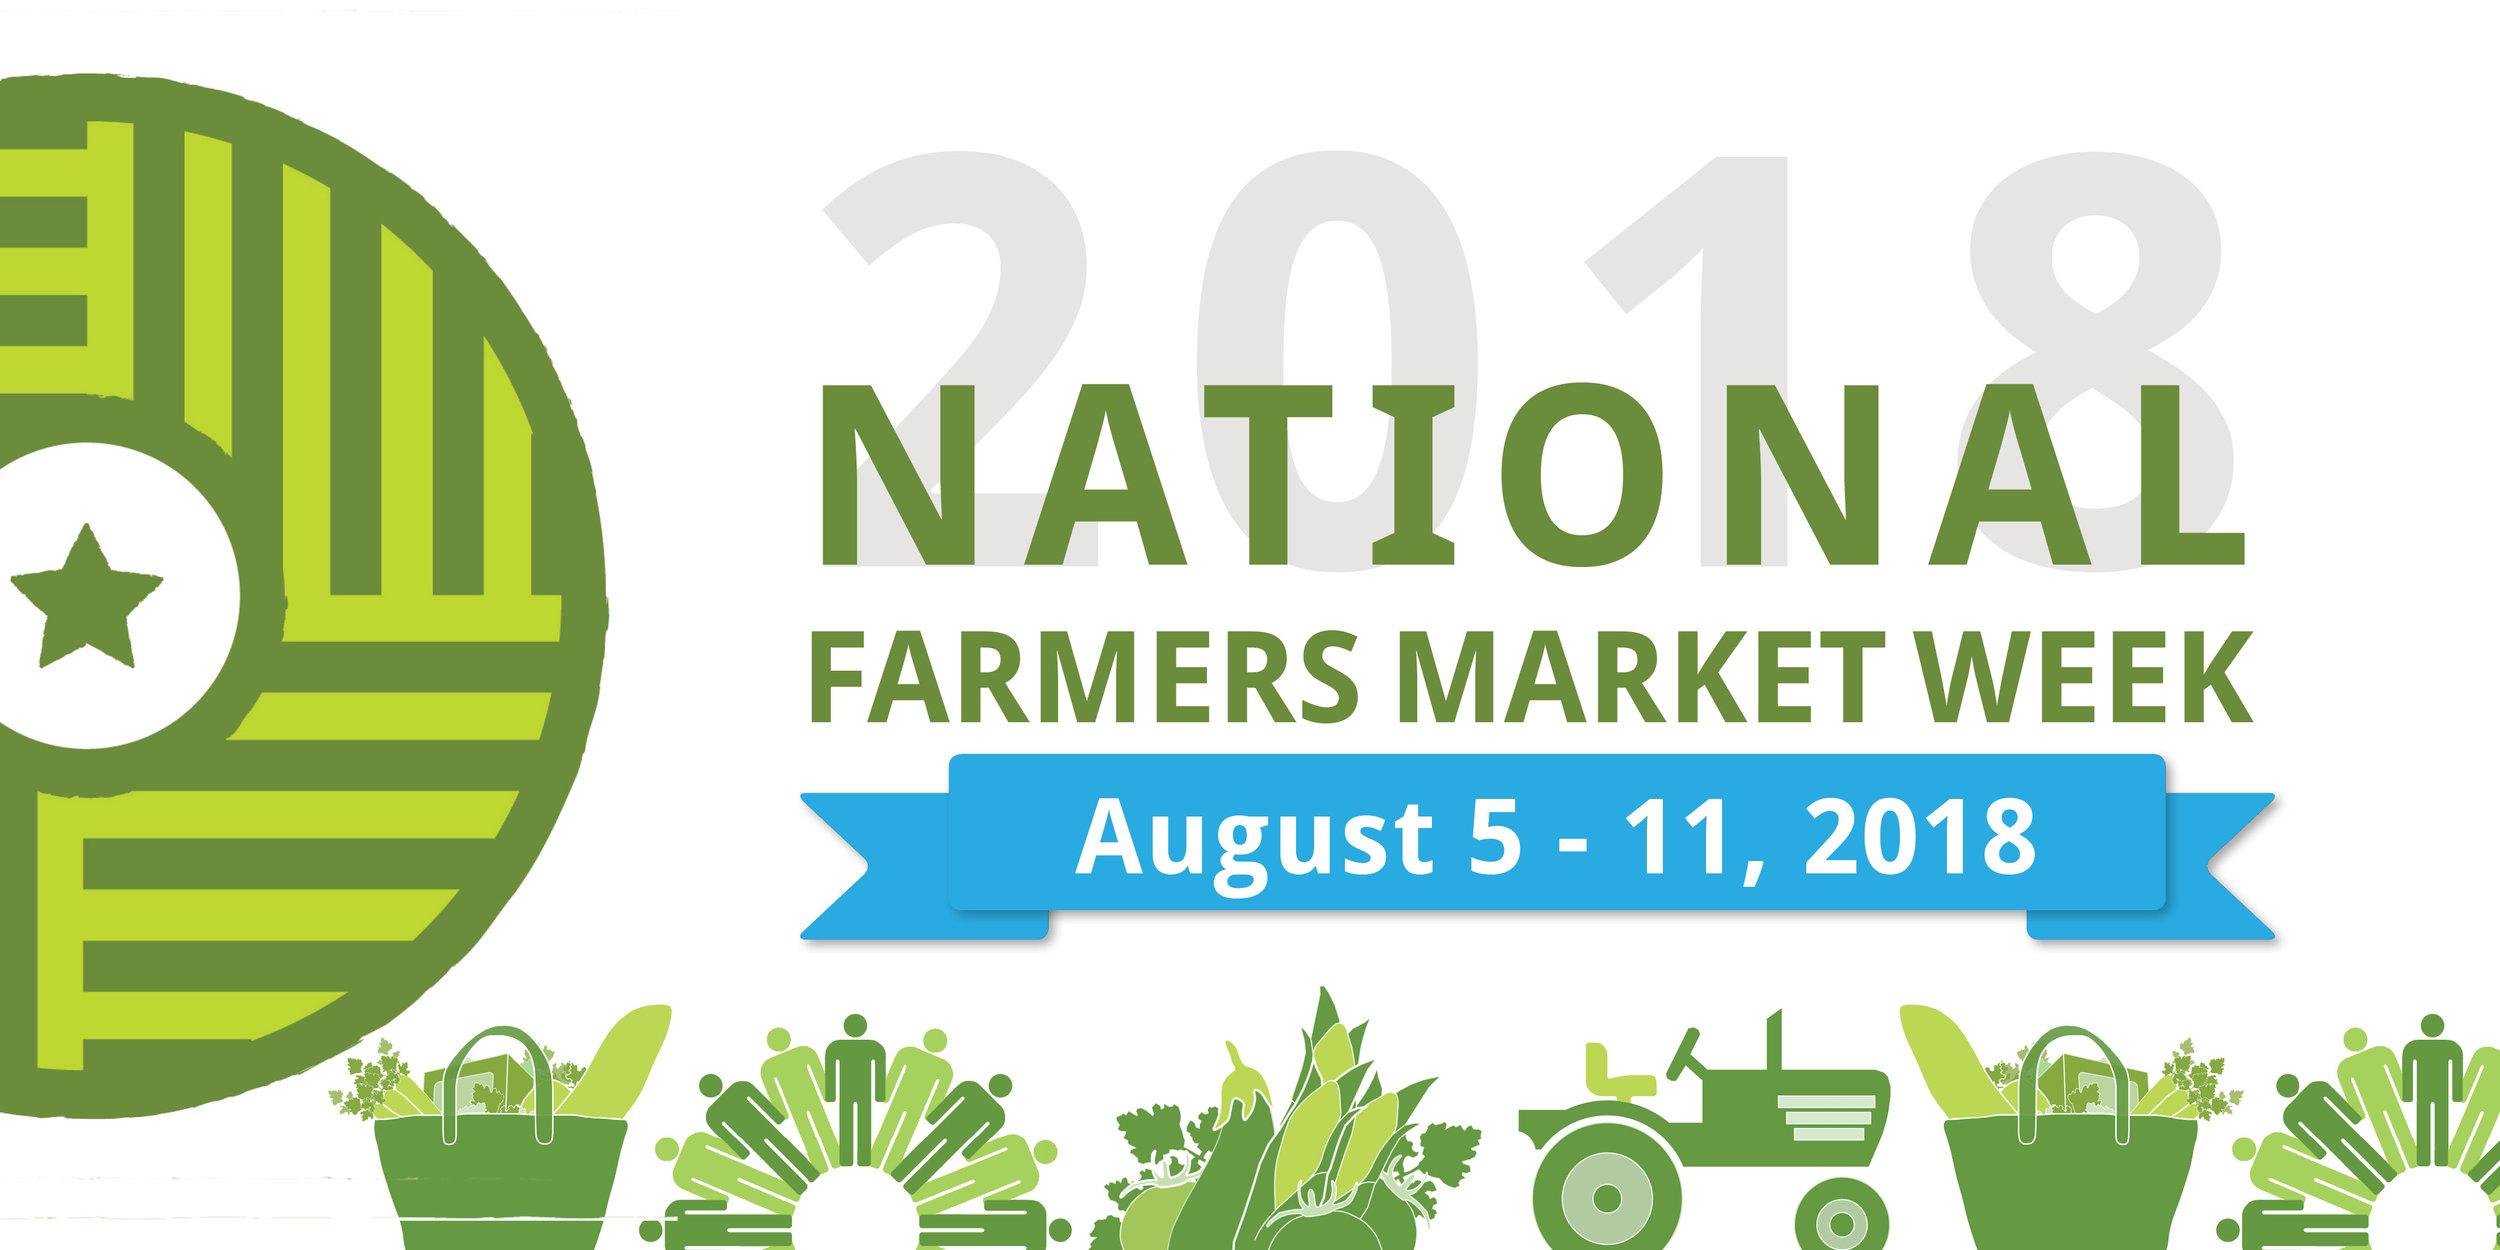 Celebrate Farmers Markets Aug 5-11, 2018 -